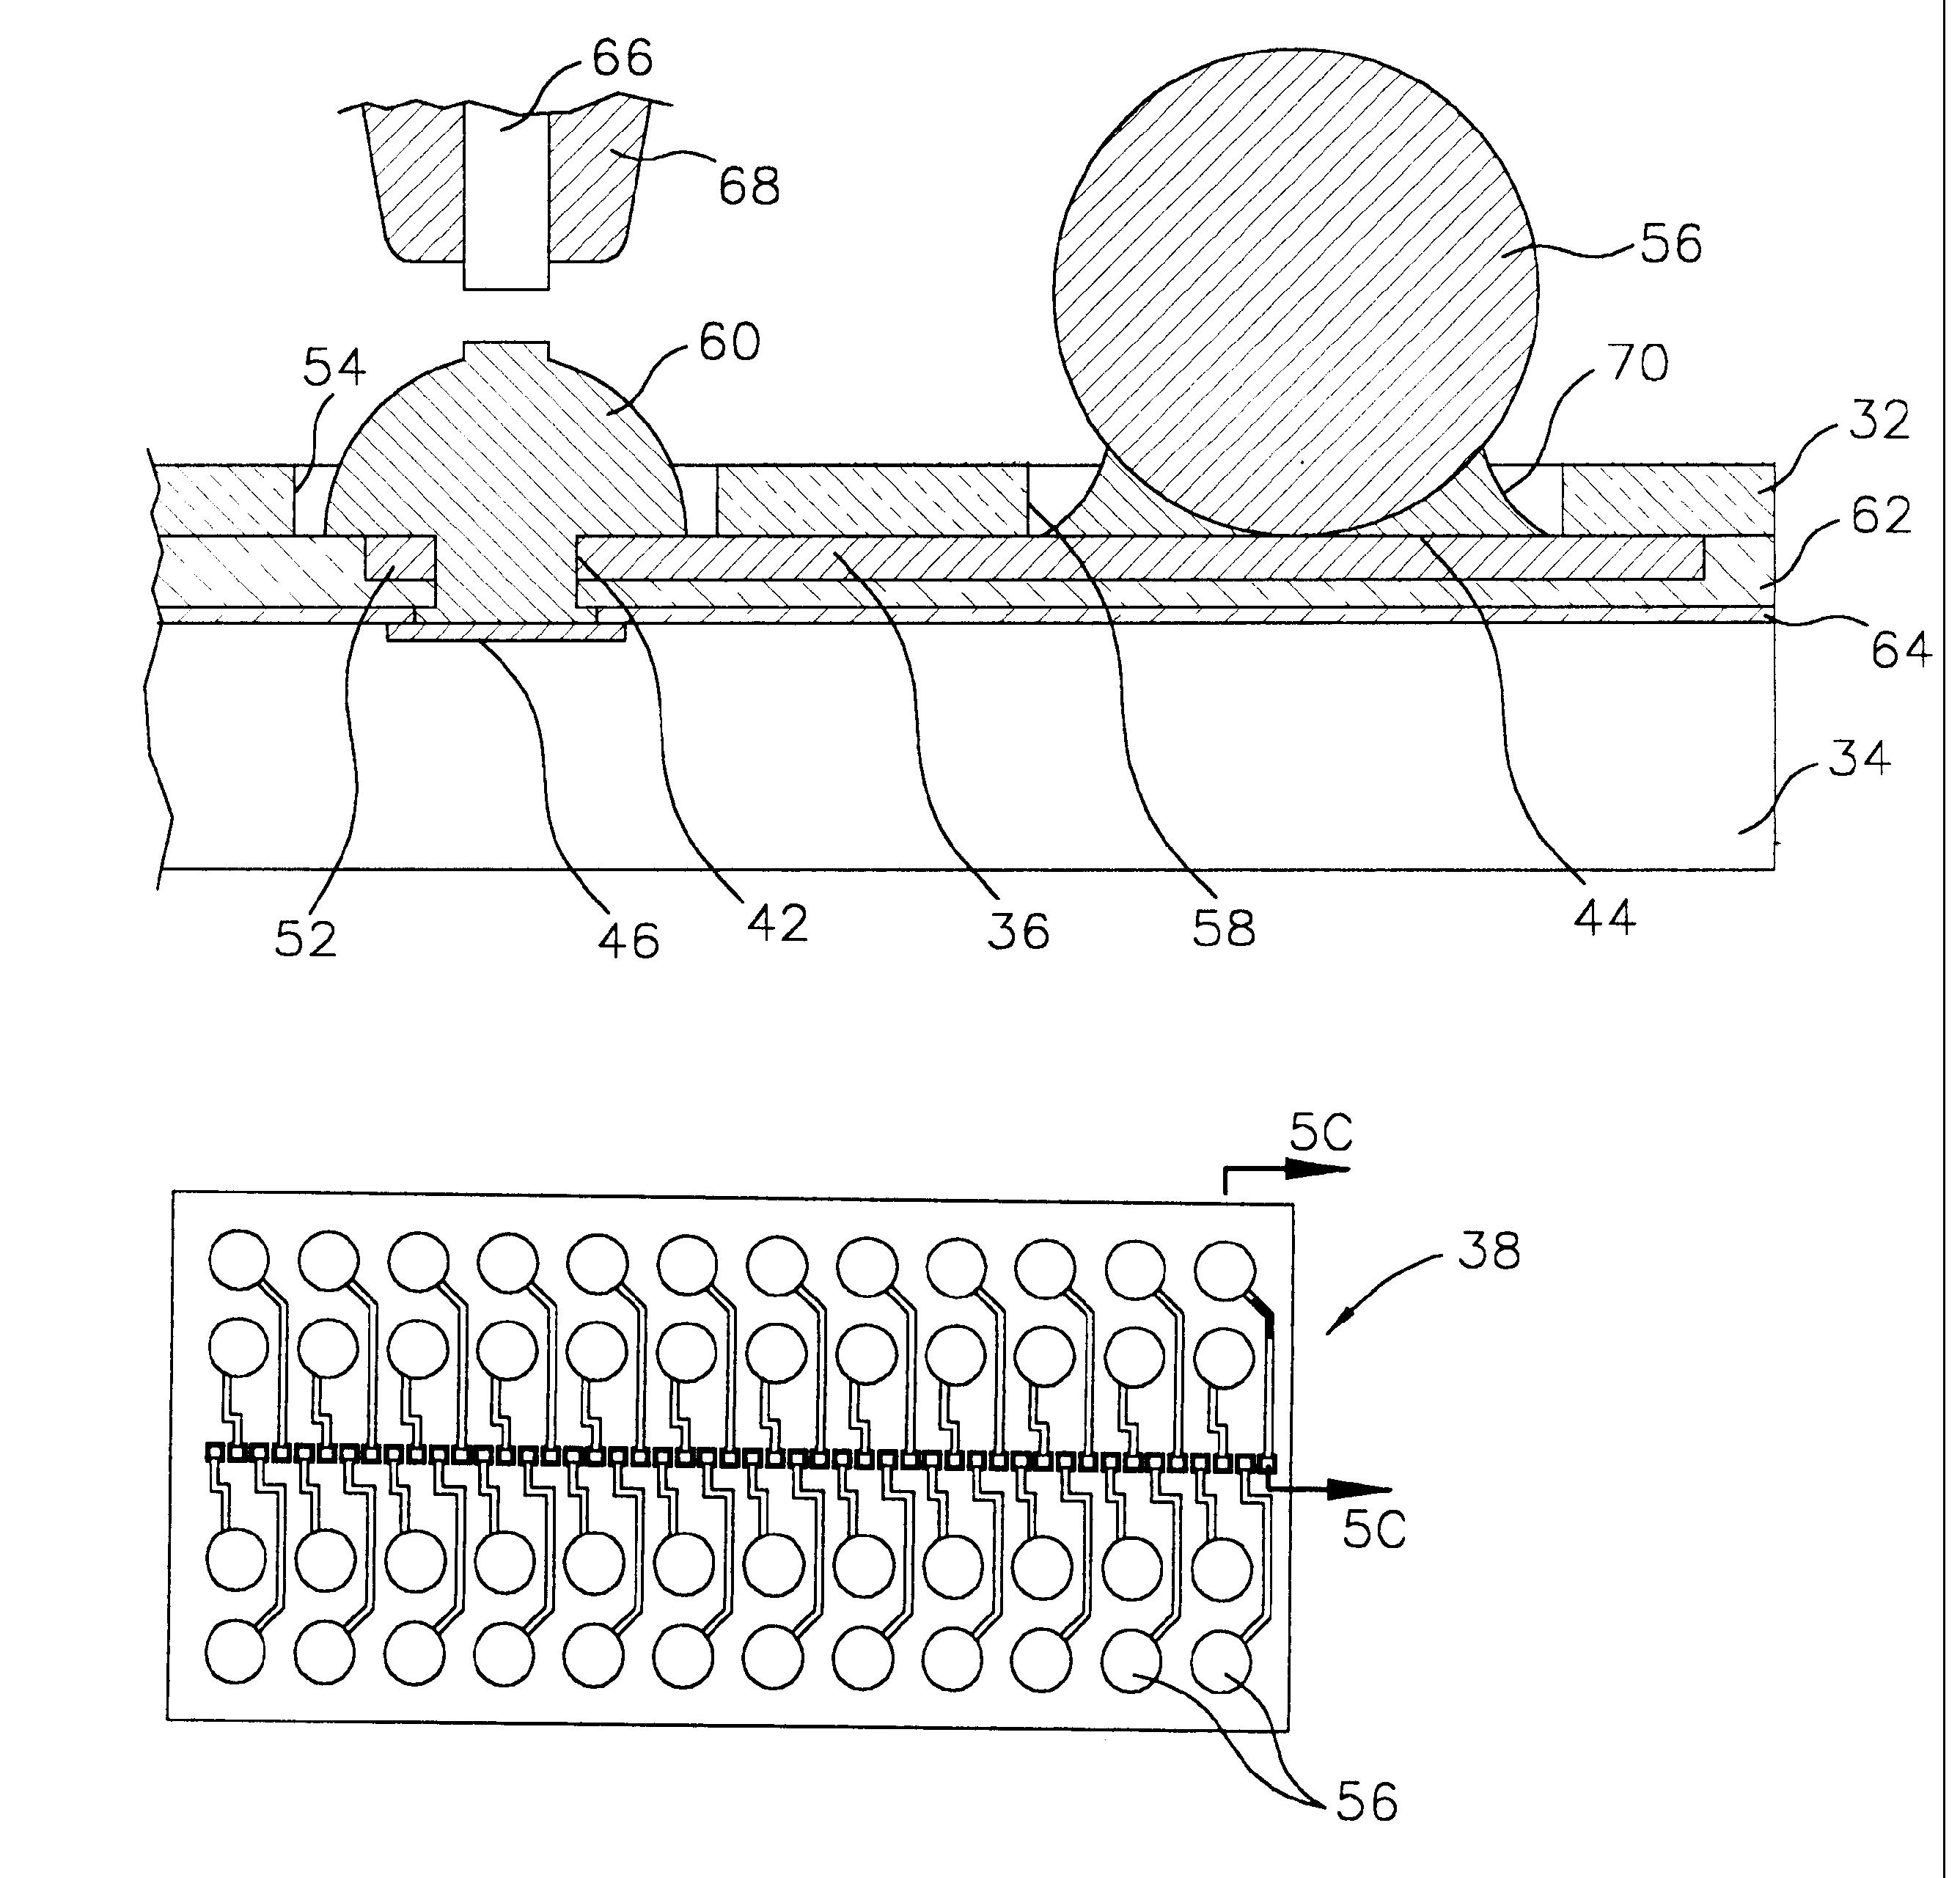 patente us6232666